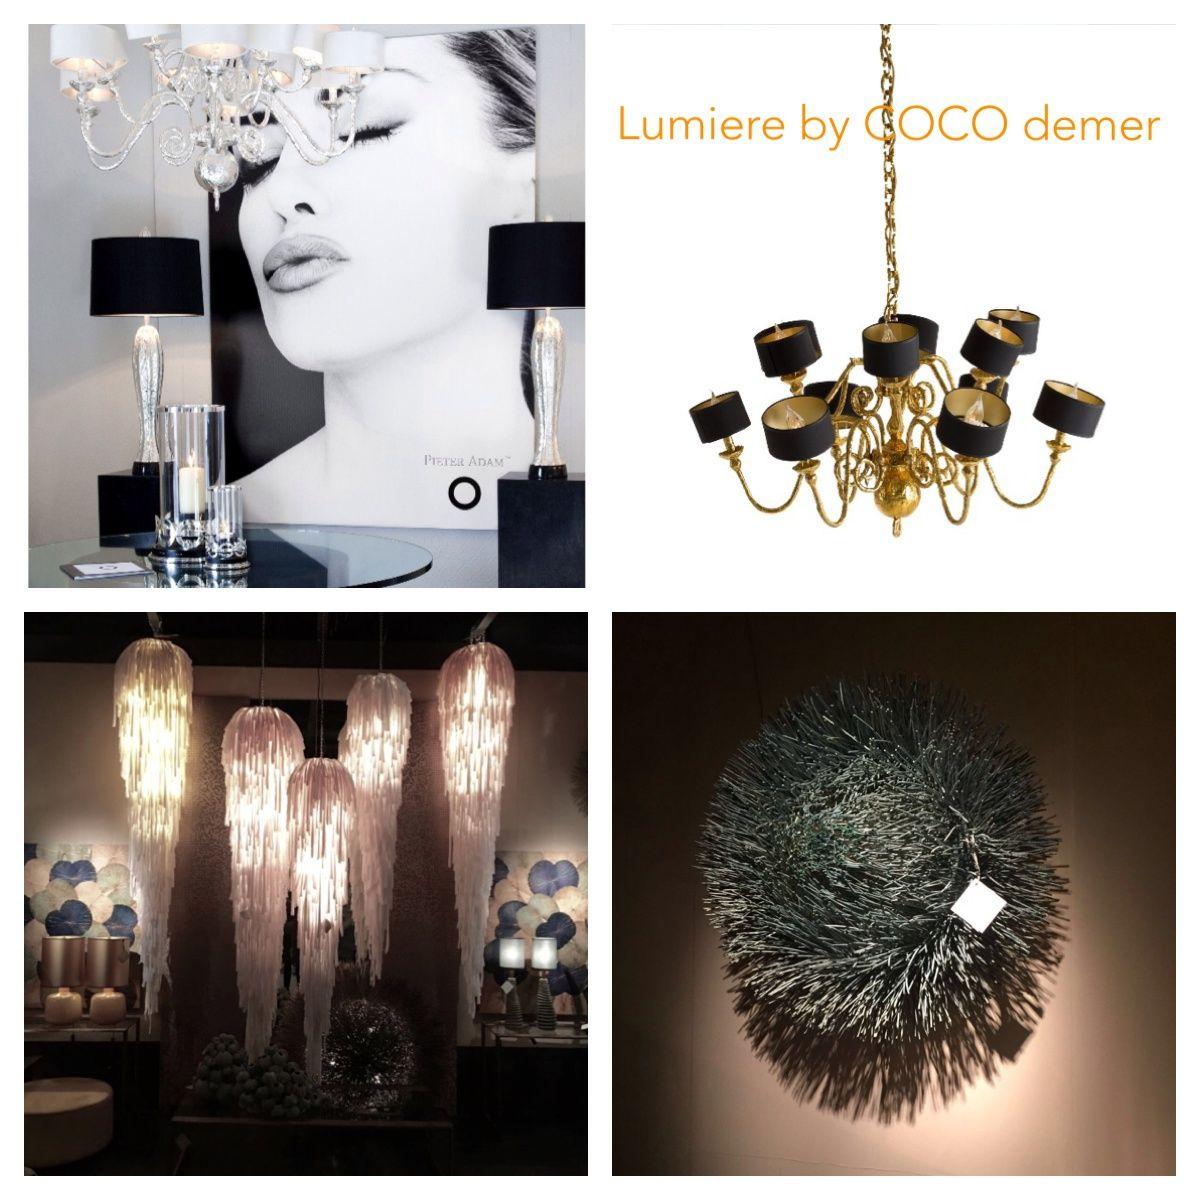 Luxery handmade lighting by pieter adams lumiere cocos luxery handmade lighting by pieter adams lumiere arubaitofo Gallery